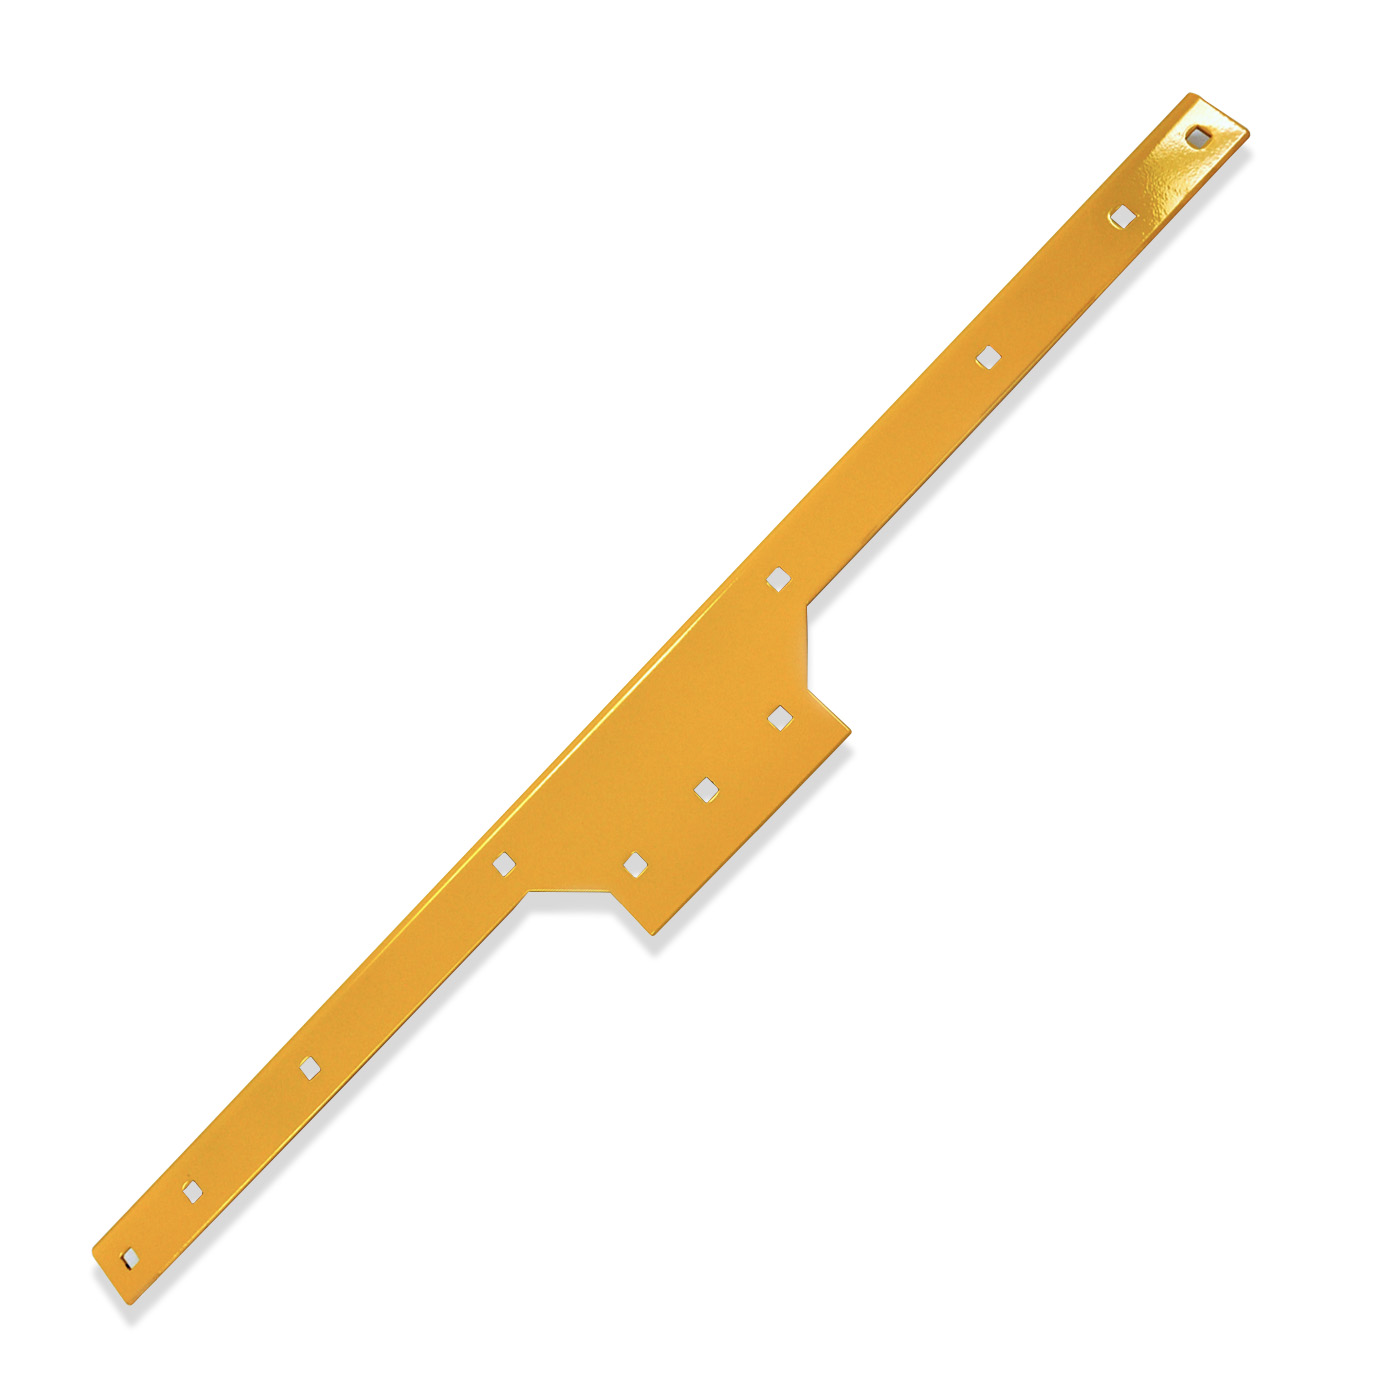 A12822-double-panel-bracket-1400w